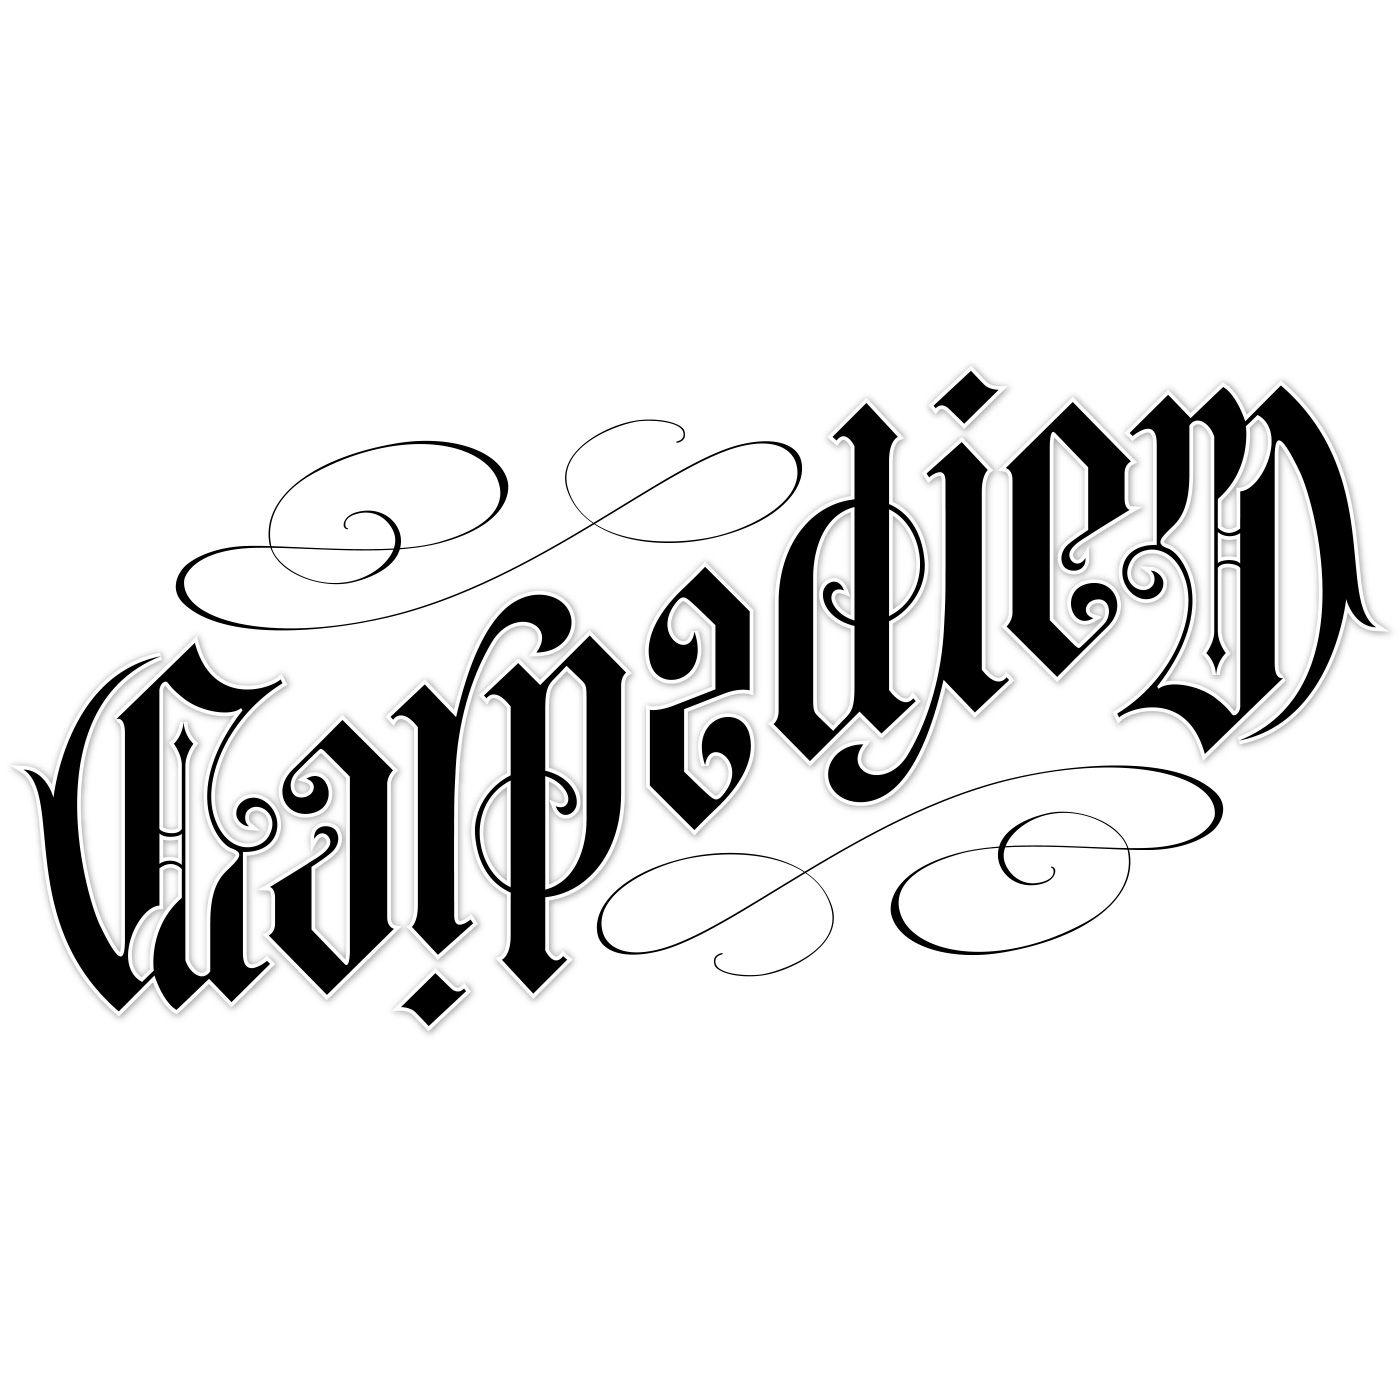 Carpe diem ambigram by john langdon